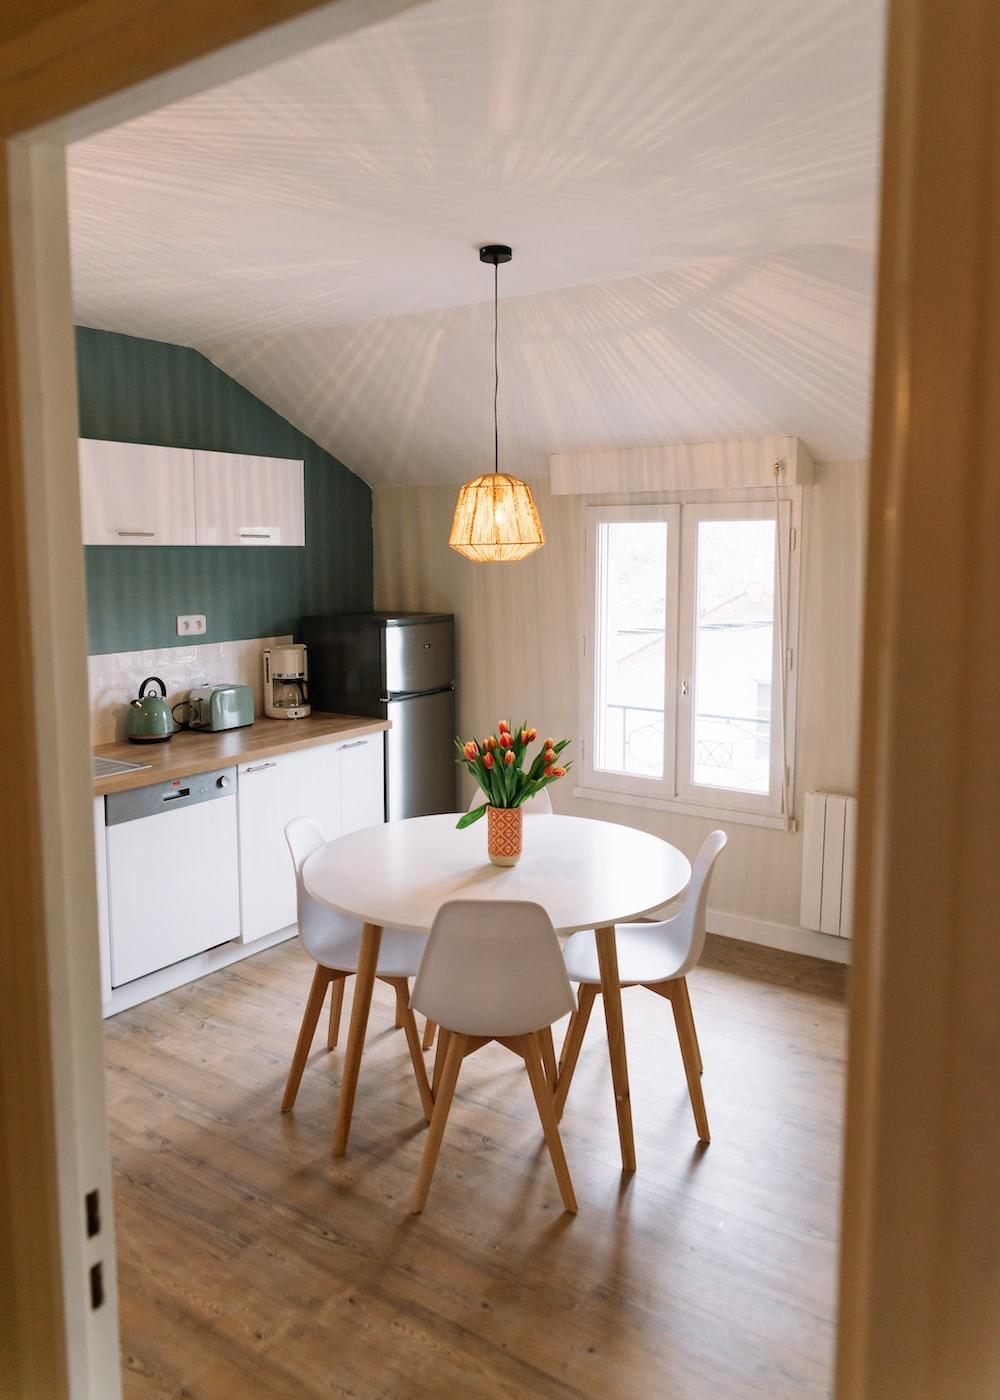 Astonishing Round Brown Wooden Frame White Wooden Dining Table Set Photo Inzonedesignstudio Interior Chair Design Inzonedesignstudiocom